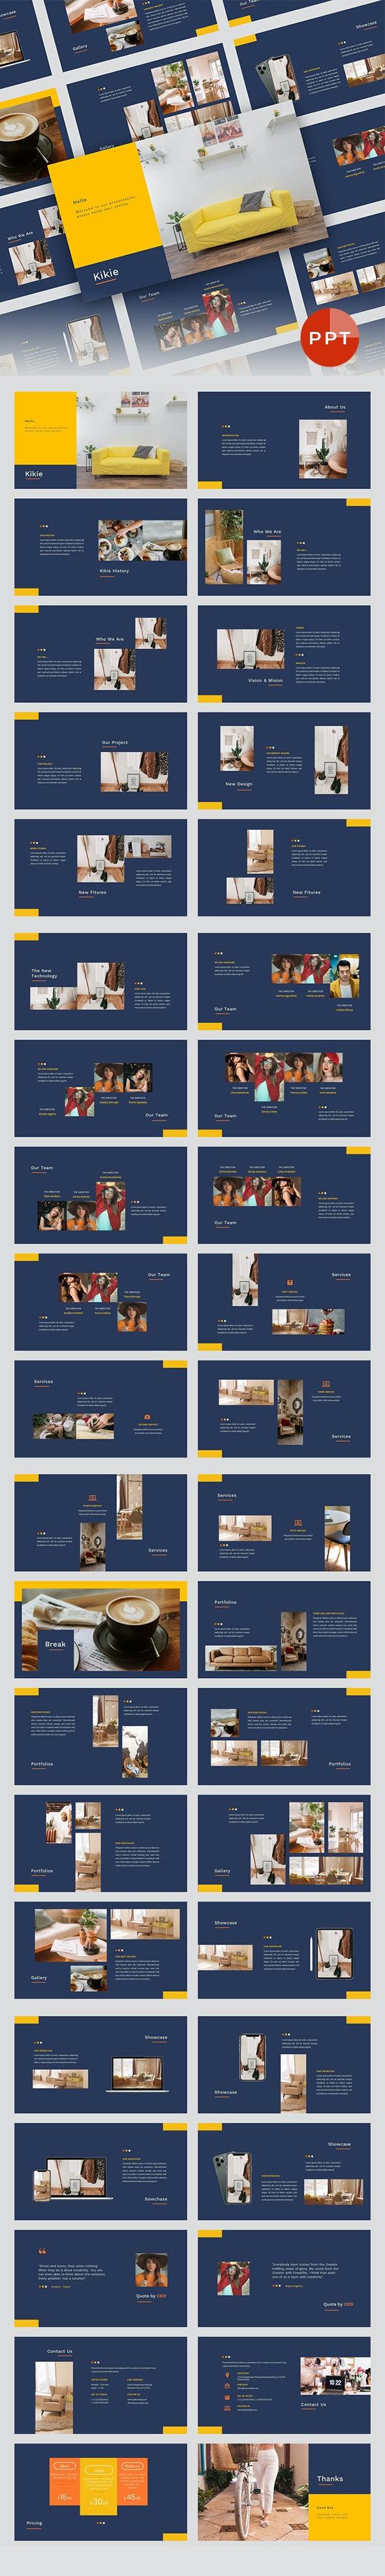 Kikie – Creative Business & Elegant PowerPoint Template - Business PowerPoint Templates